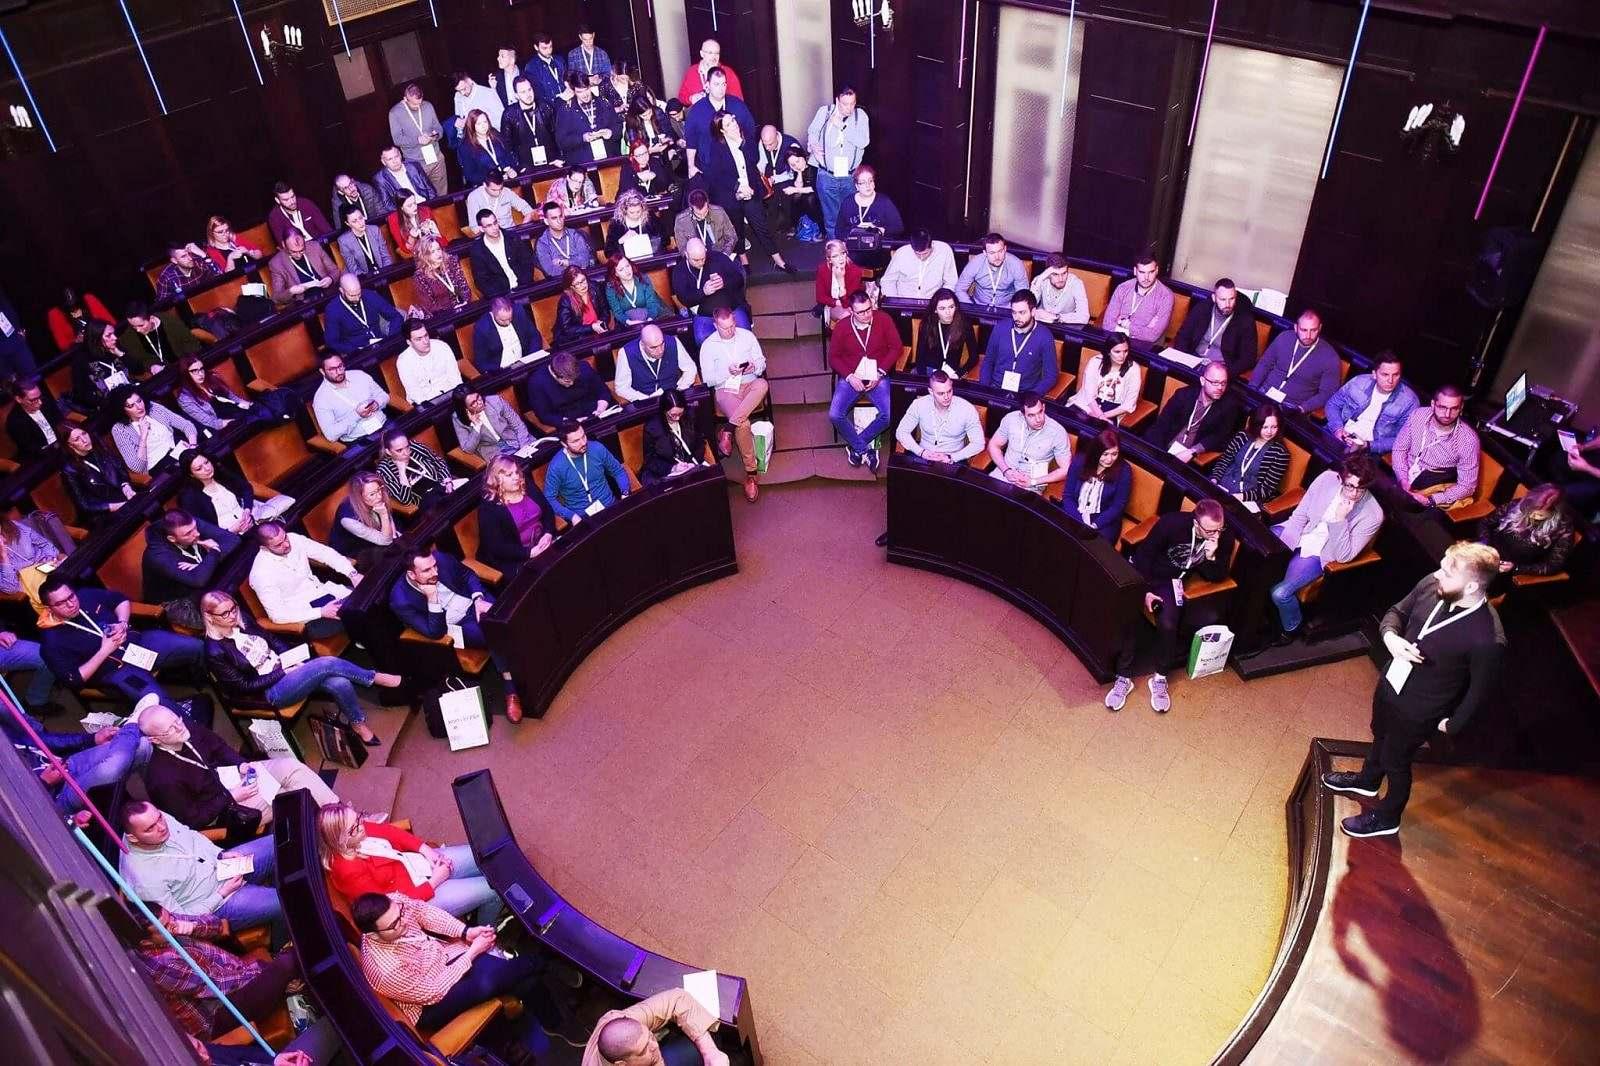 keynote speaker at Konverzija digital marketing conference